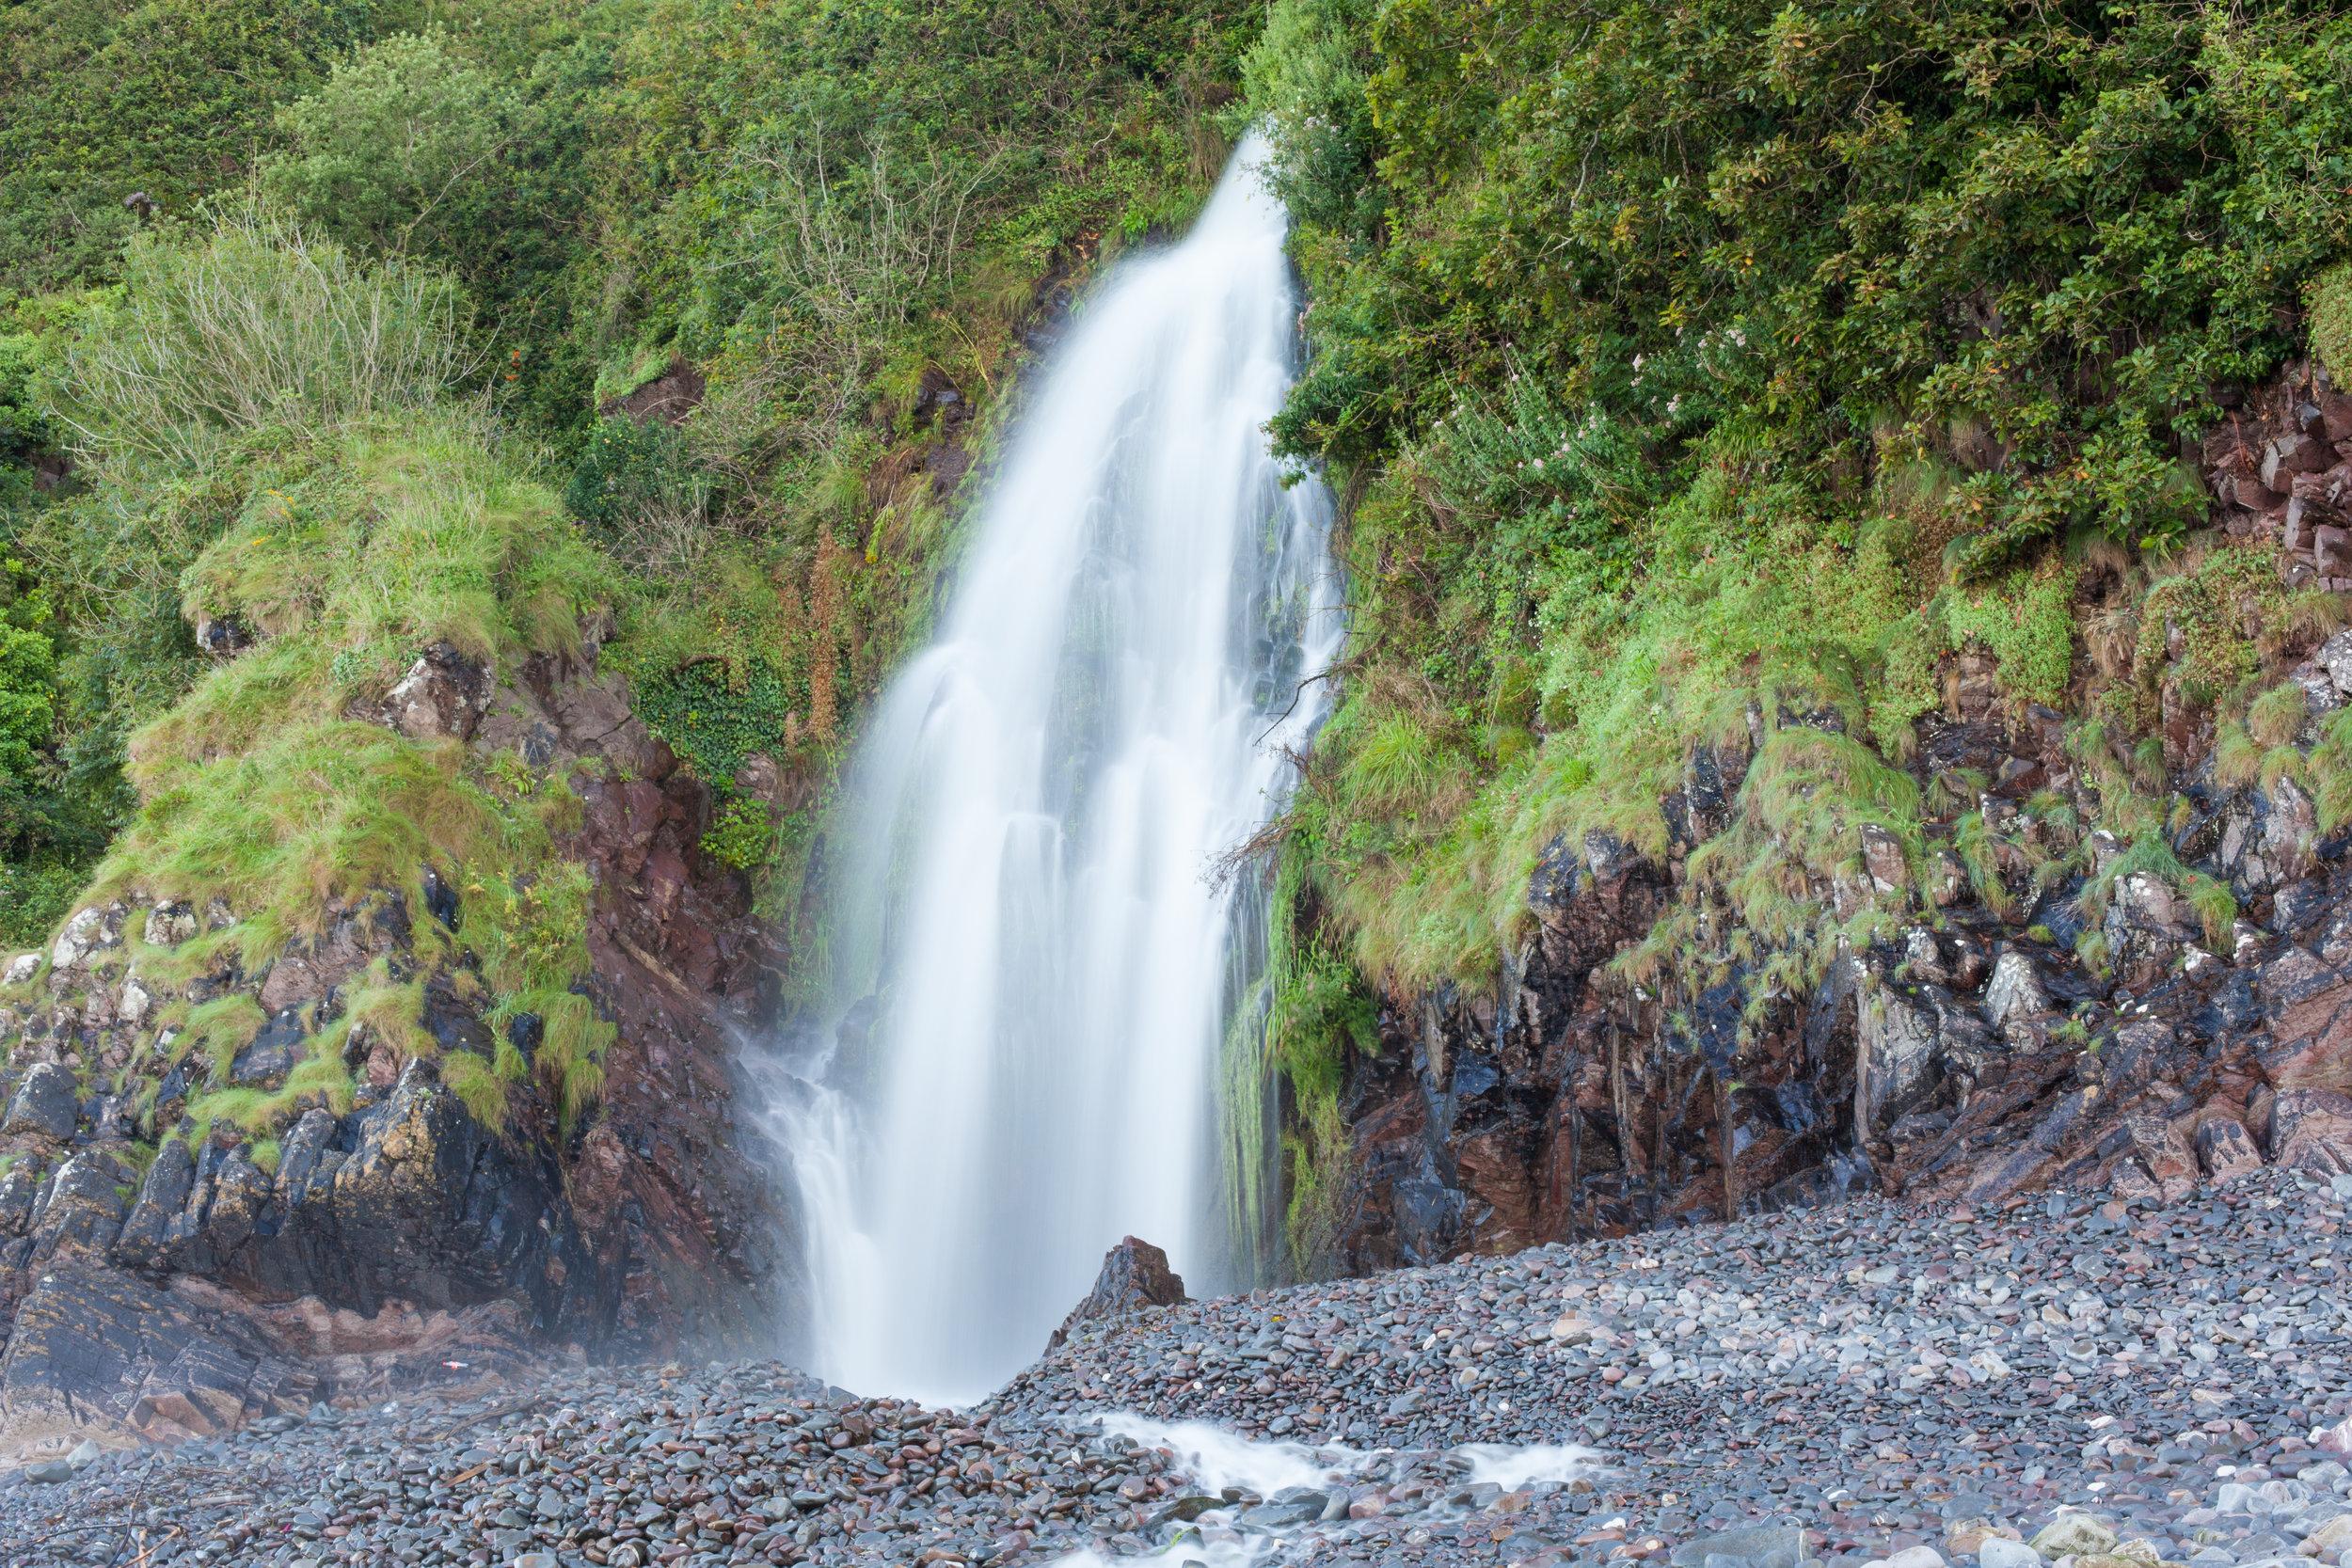 A waterfall at Clovelly Beach in Devon.